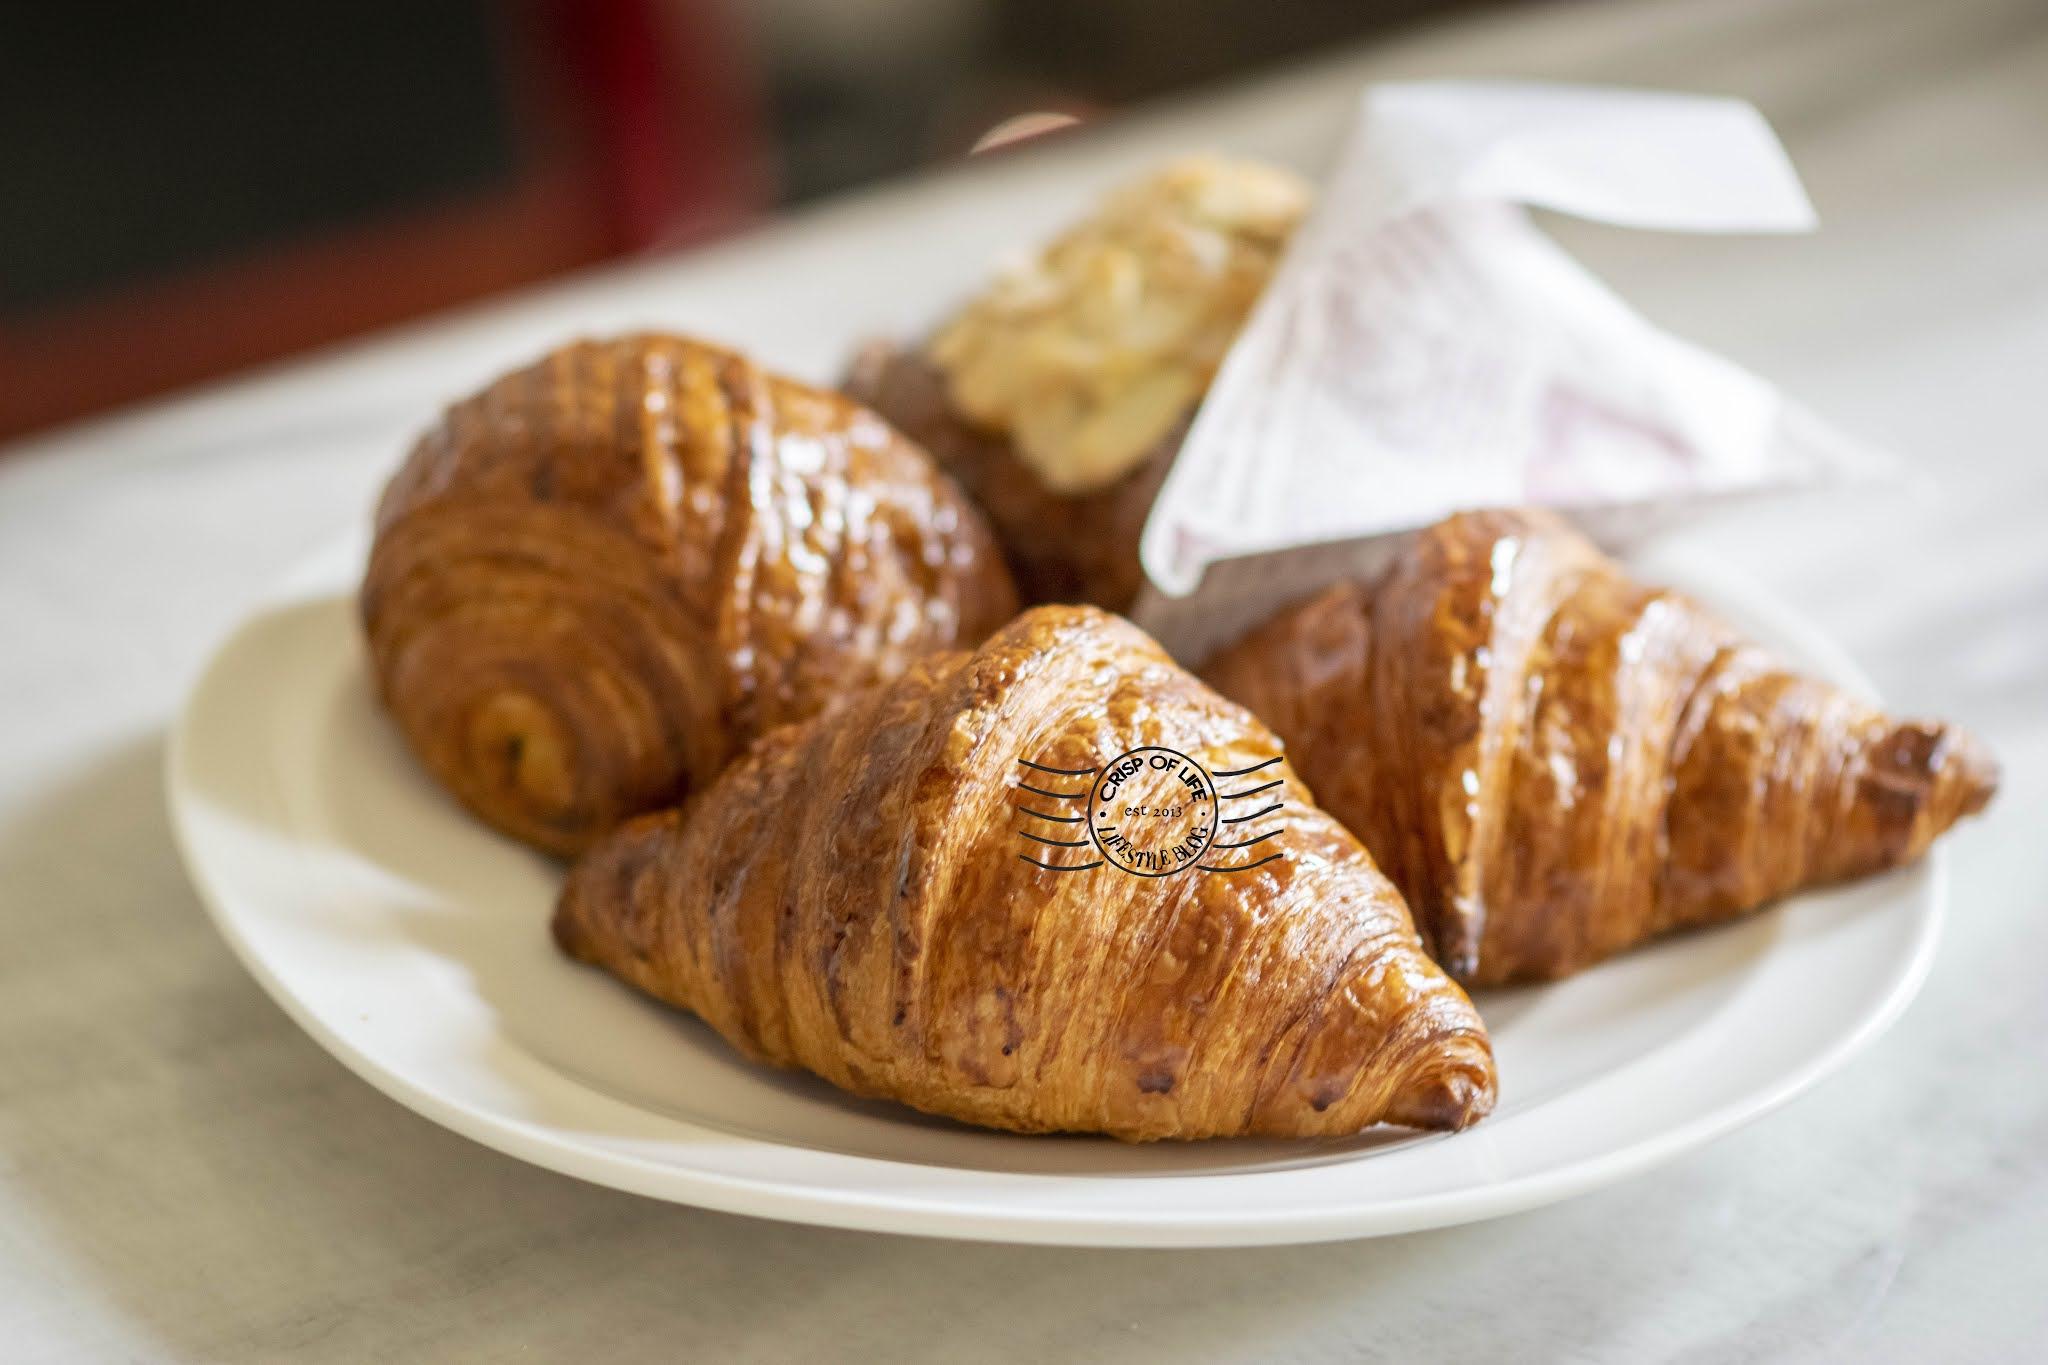 La Vie en Rose Pâtisserie - Penang Bakery That Sells Delicious French Pastries